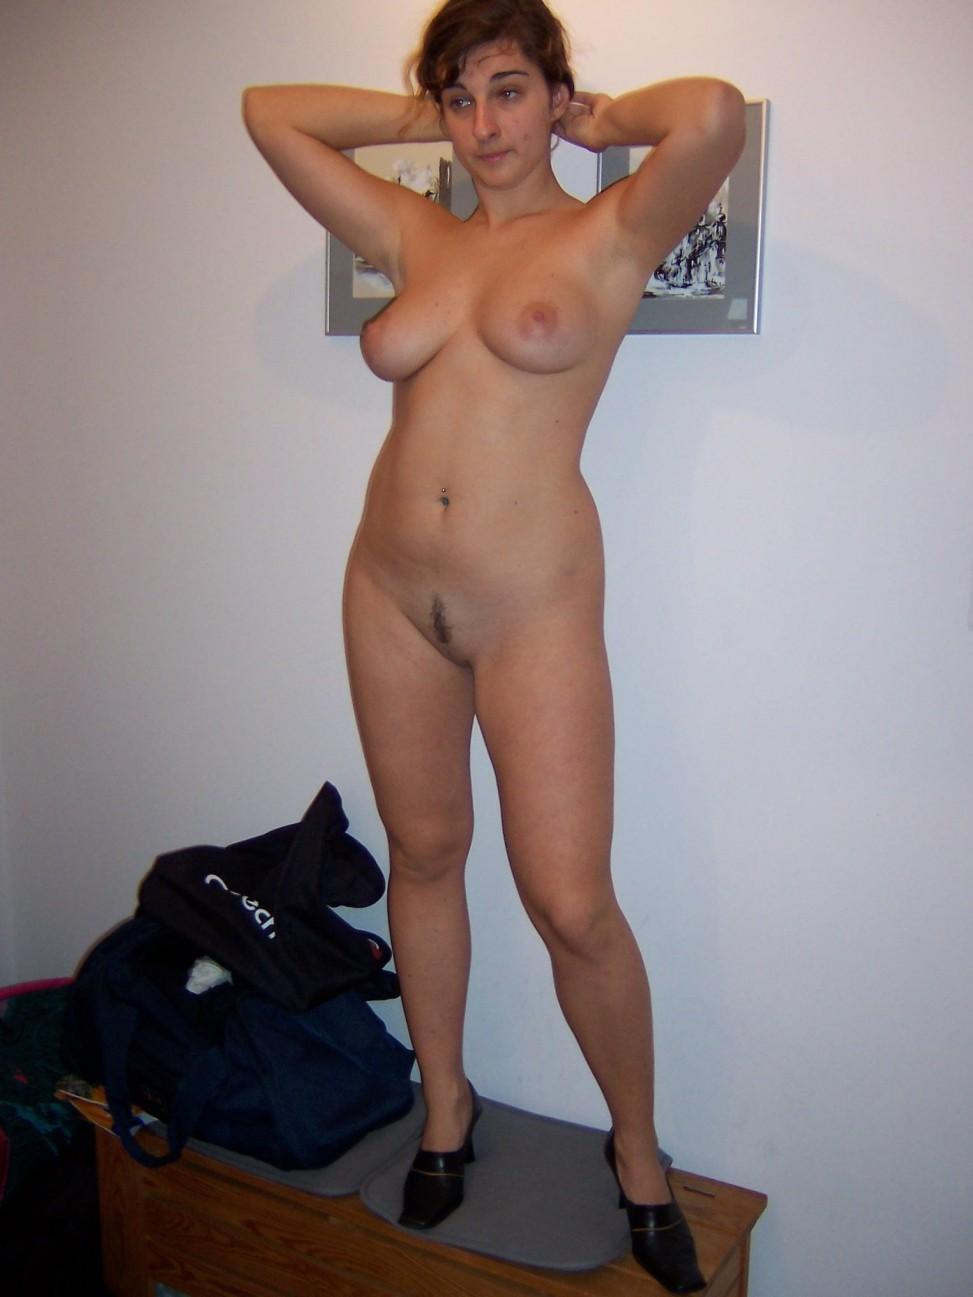 Nackt privat ehefrau Nacktfotos privat